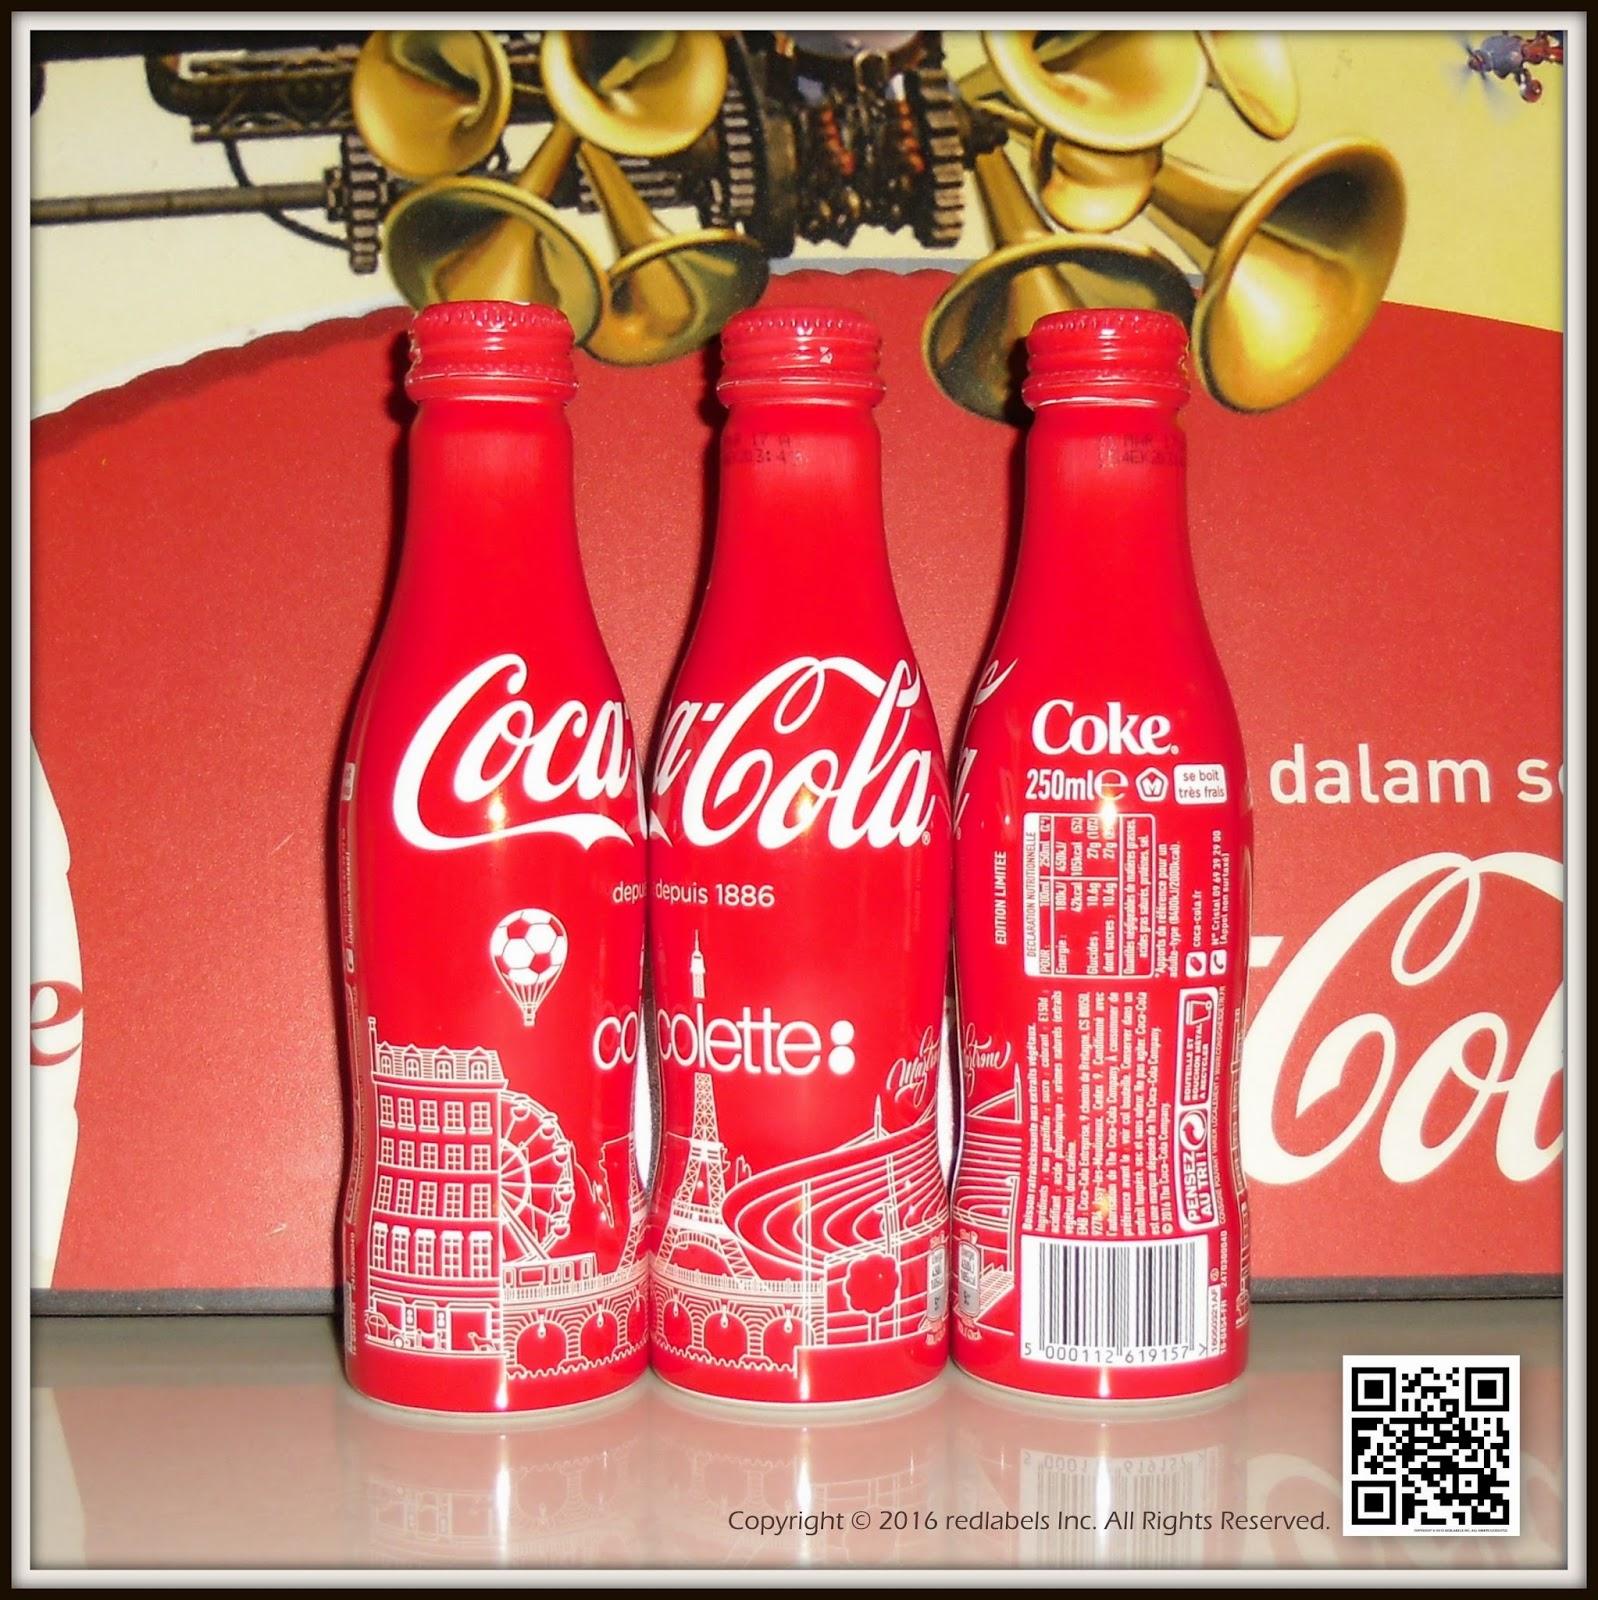 aluminum bottle collector club coca cola colette celebrate football aluminum bottle france 2016. Black Bedroom Furniture Sets. Home Design Ideas